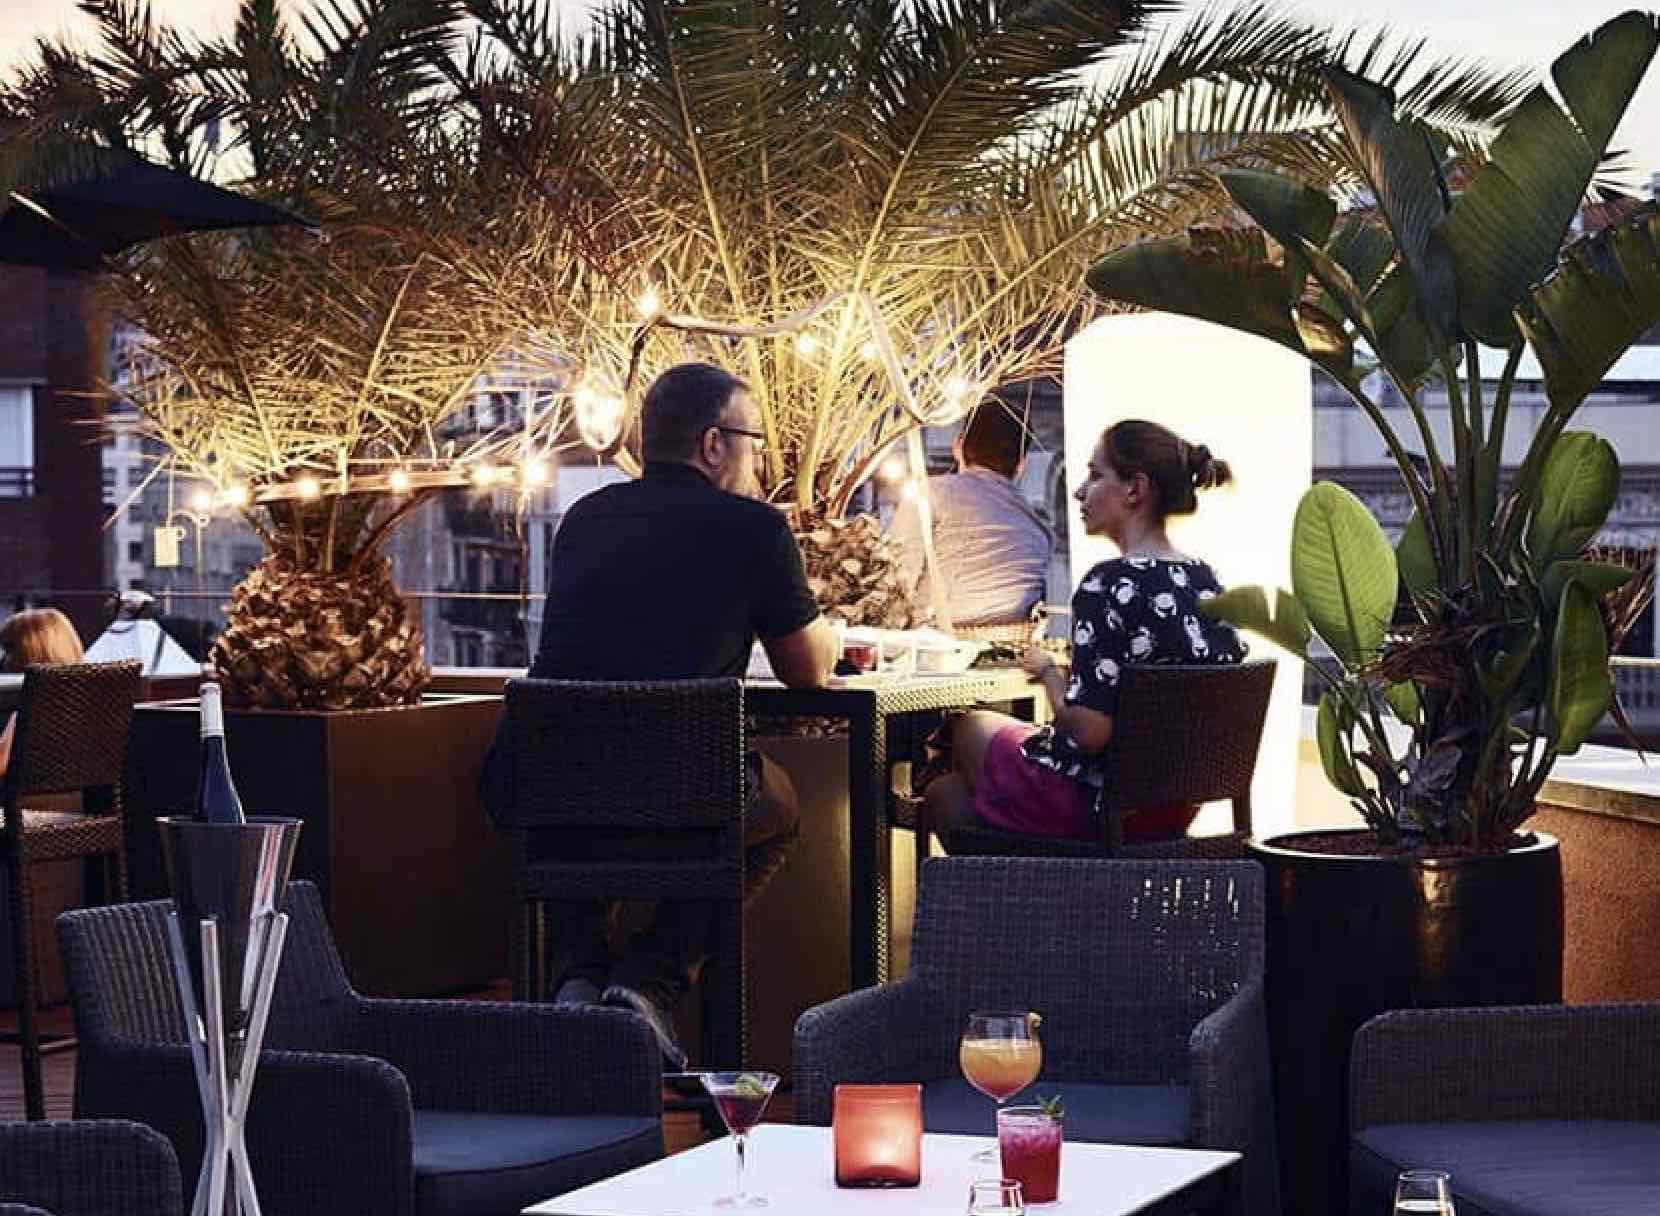 Villa Emilia people sitting at the Zinc Bar outdoors